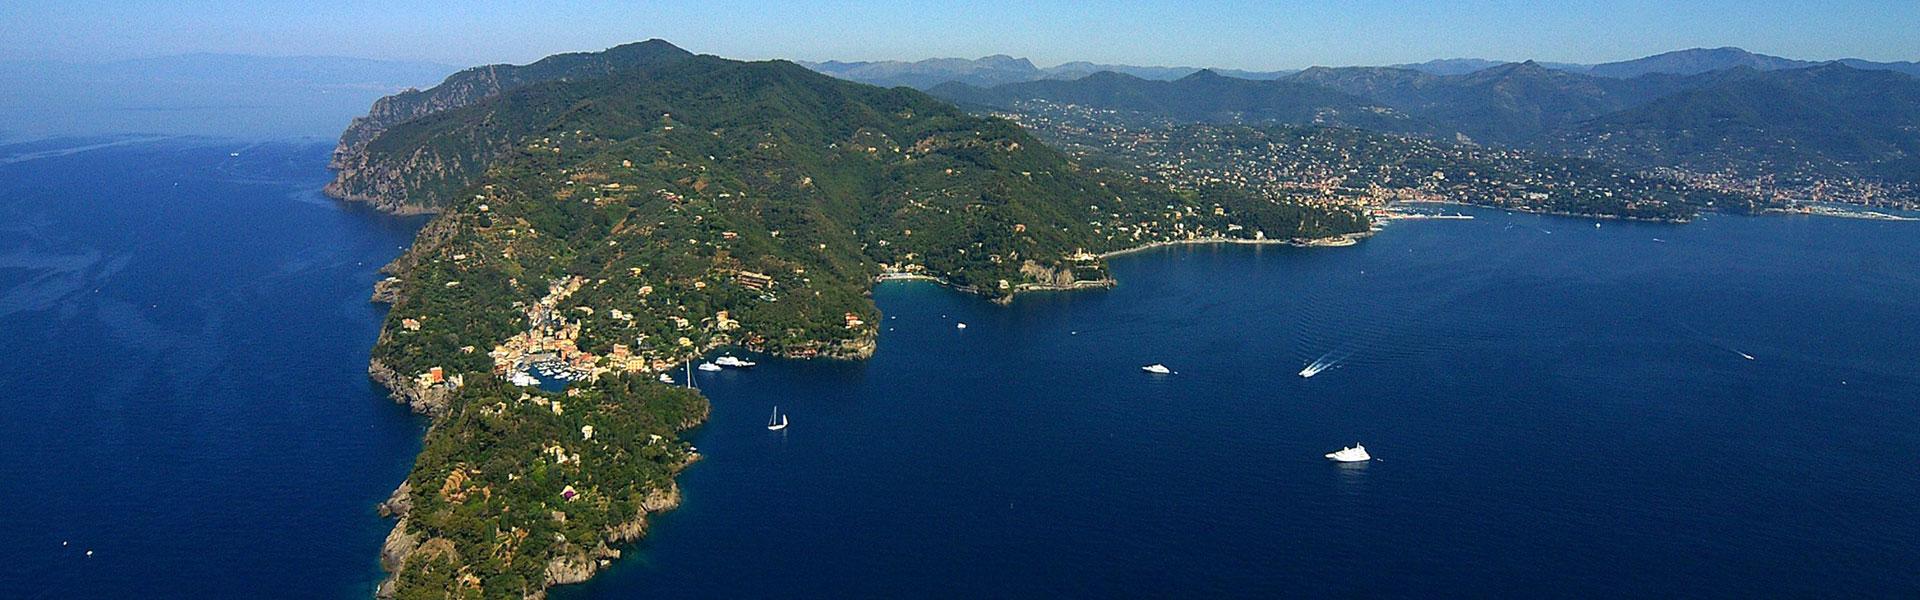 DG Portofino